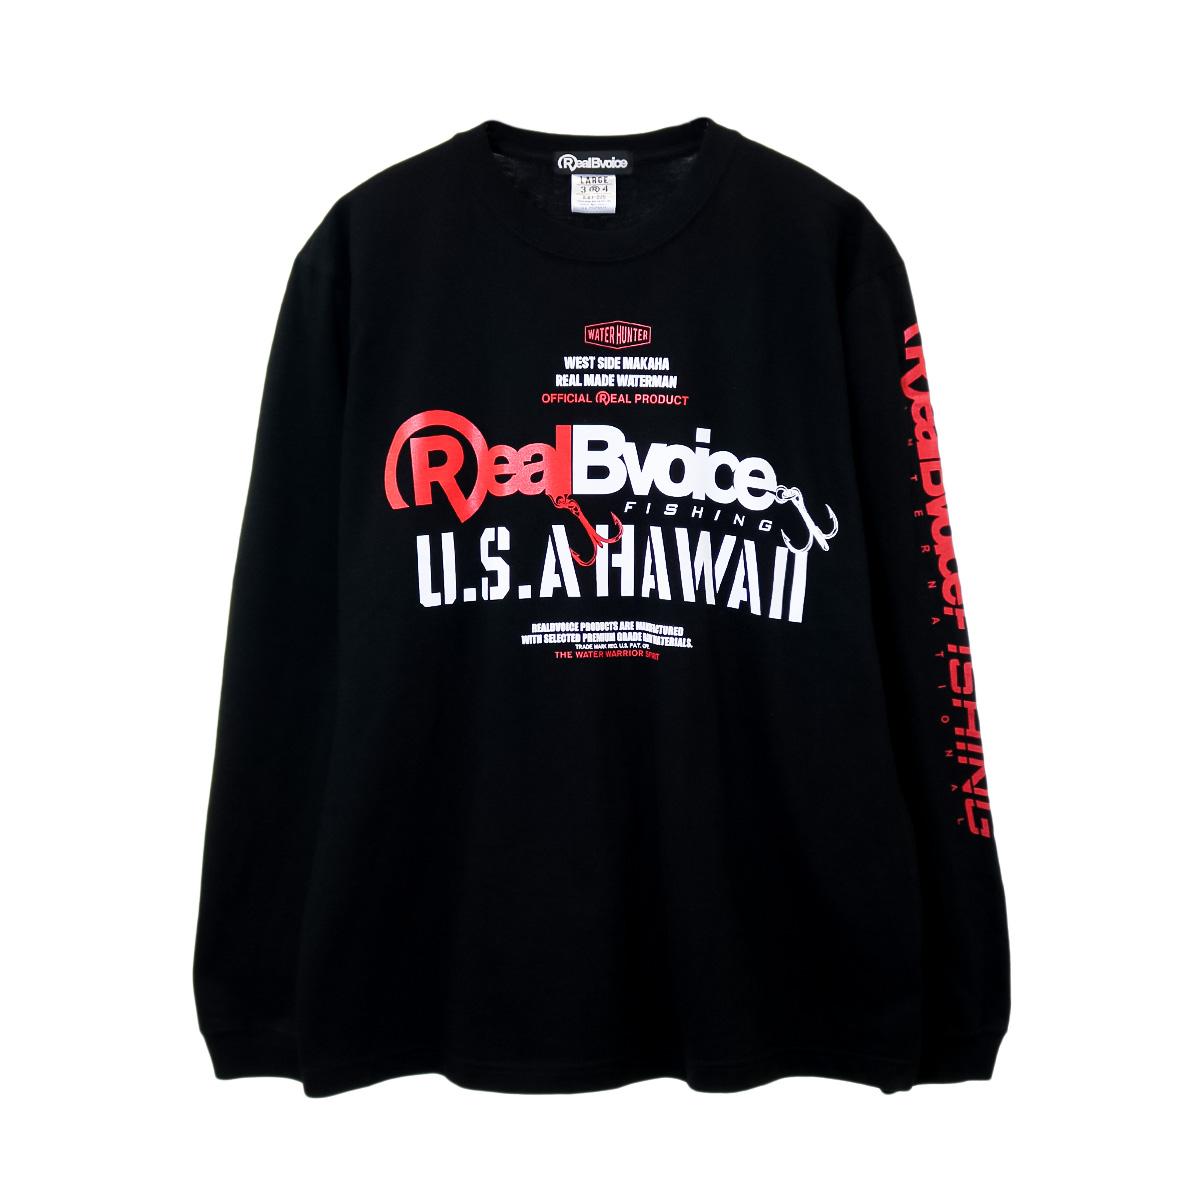 FISHING RBV U.S.A HAWAII LONG T-SHIRT